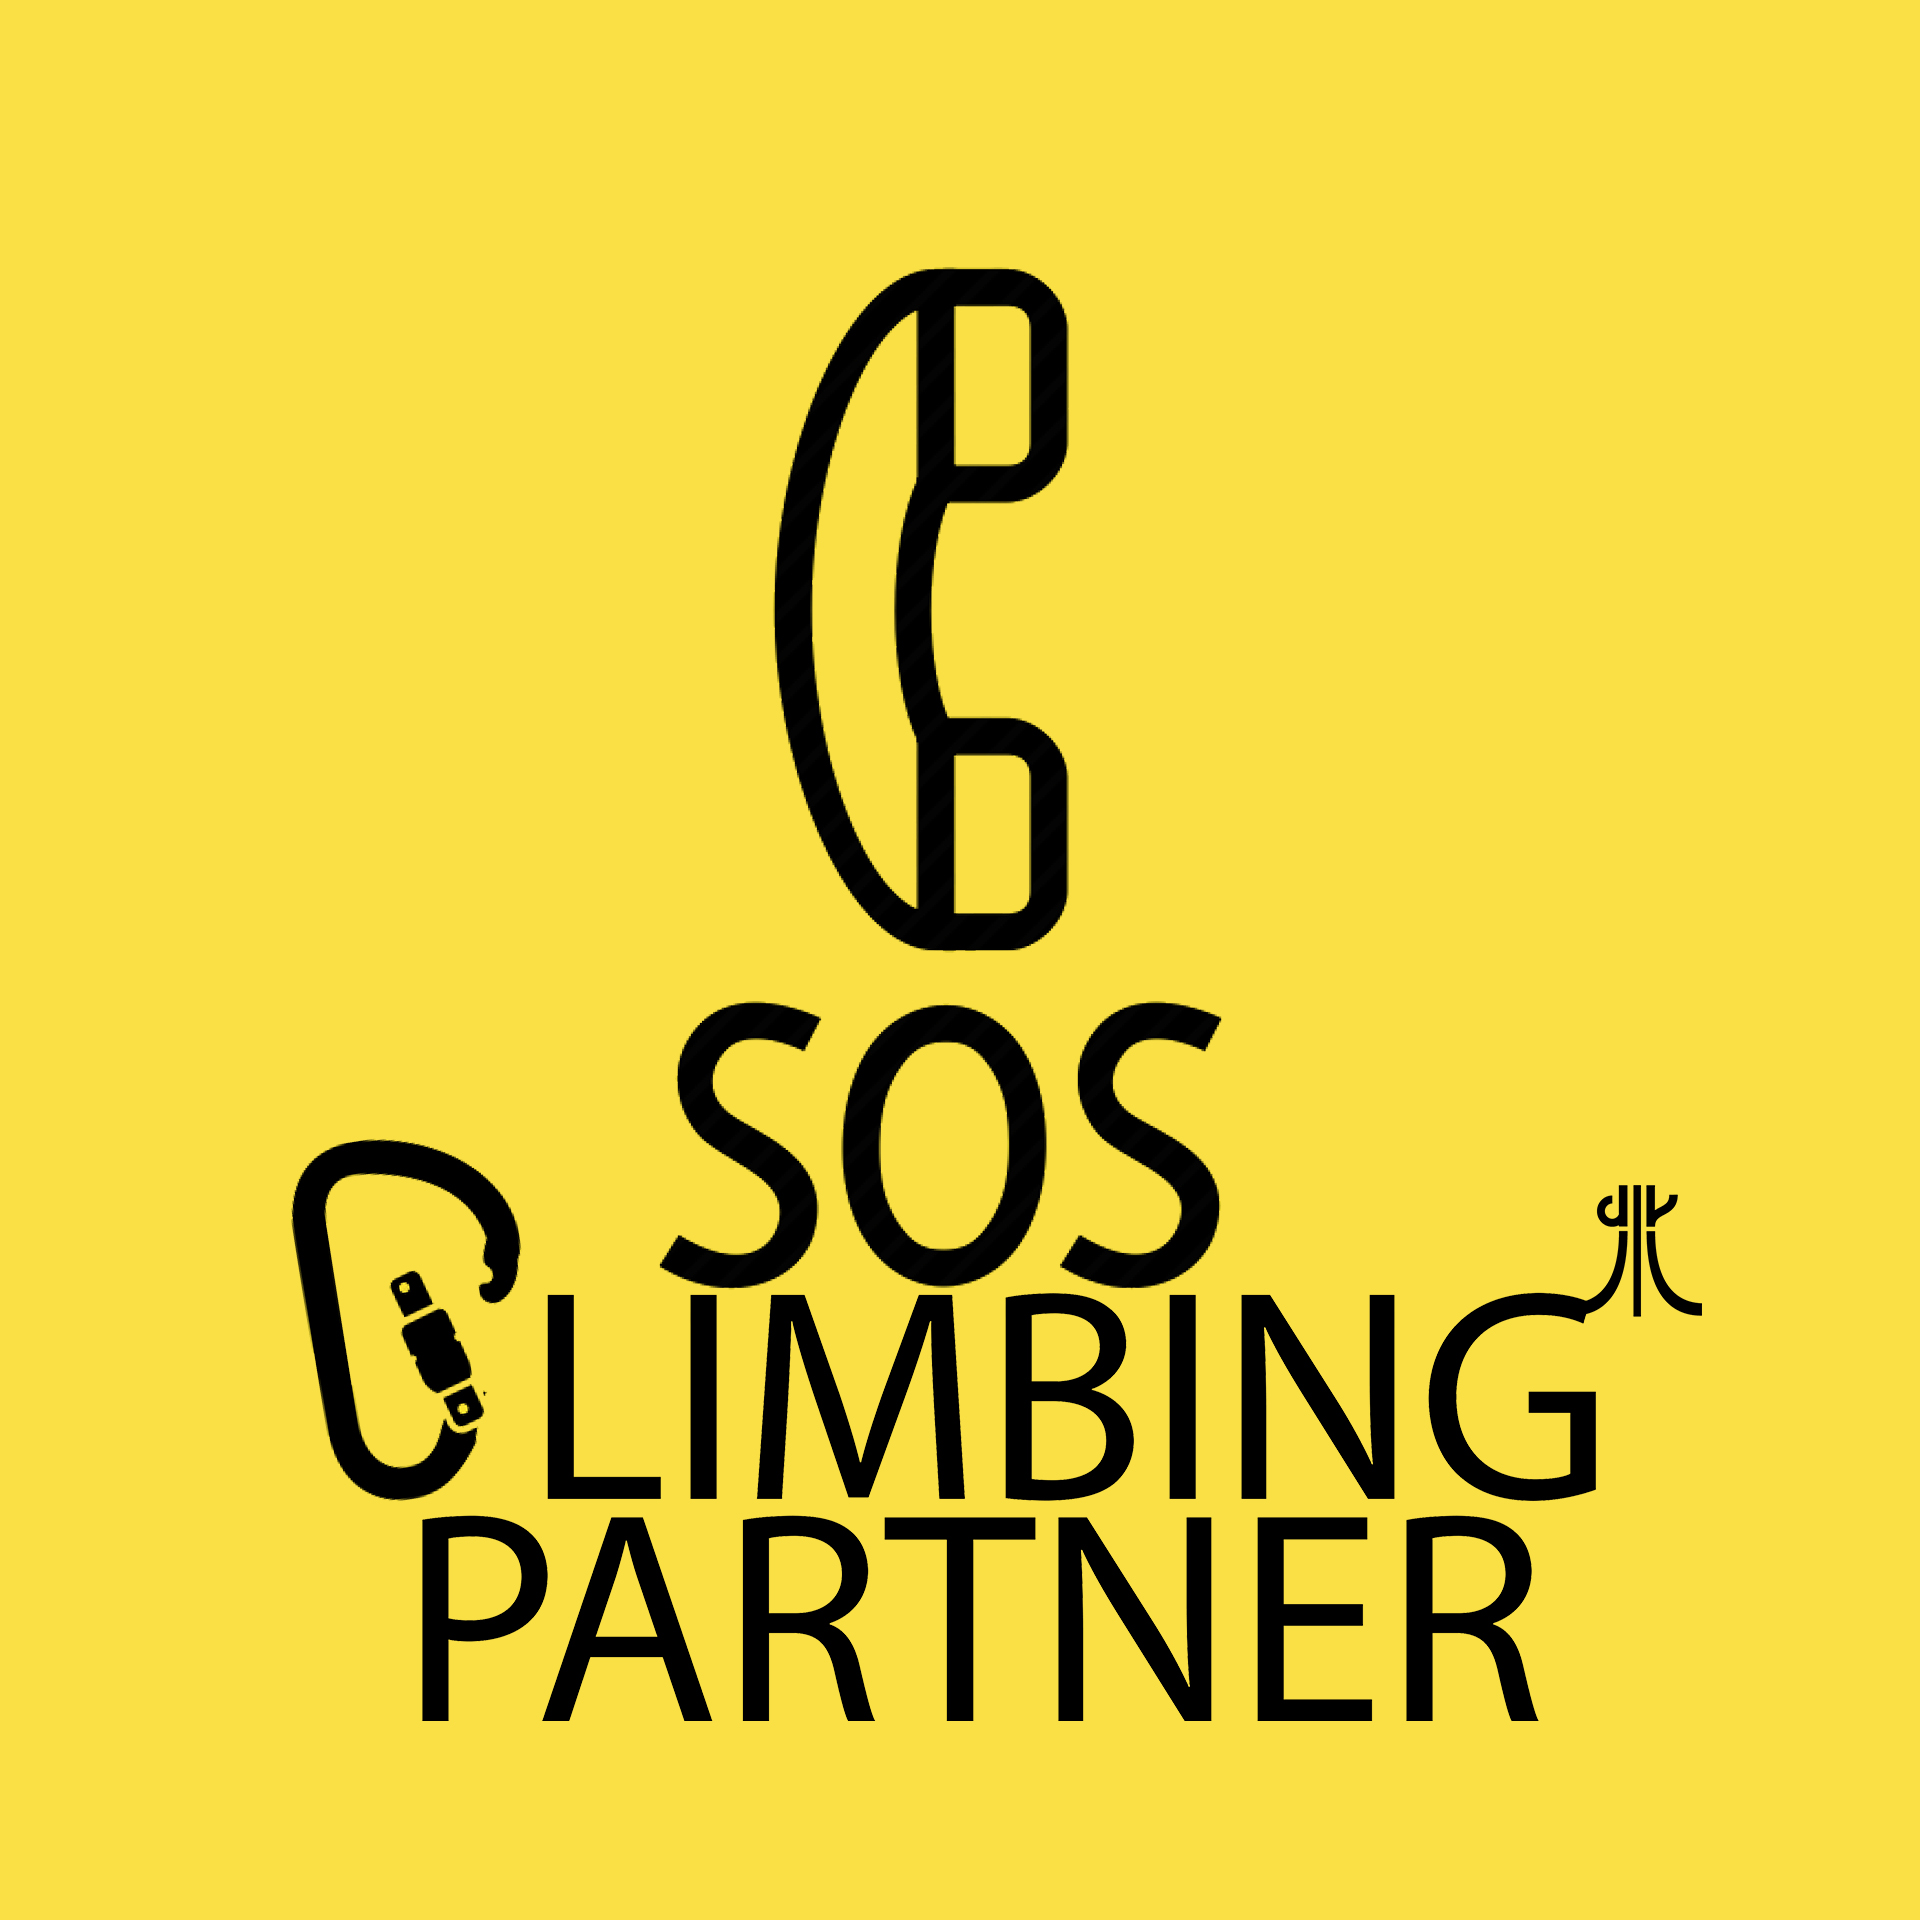 Sos Climbing Partner